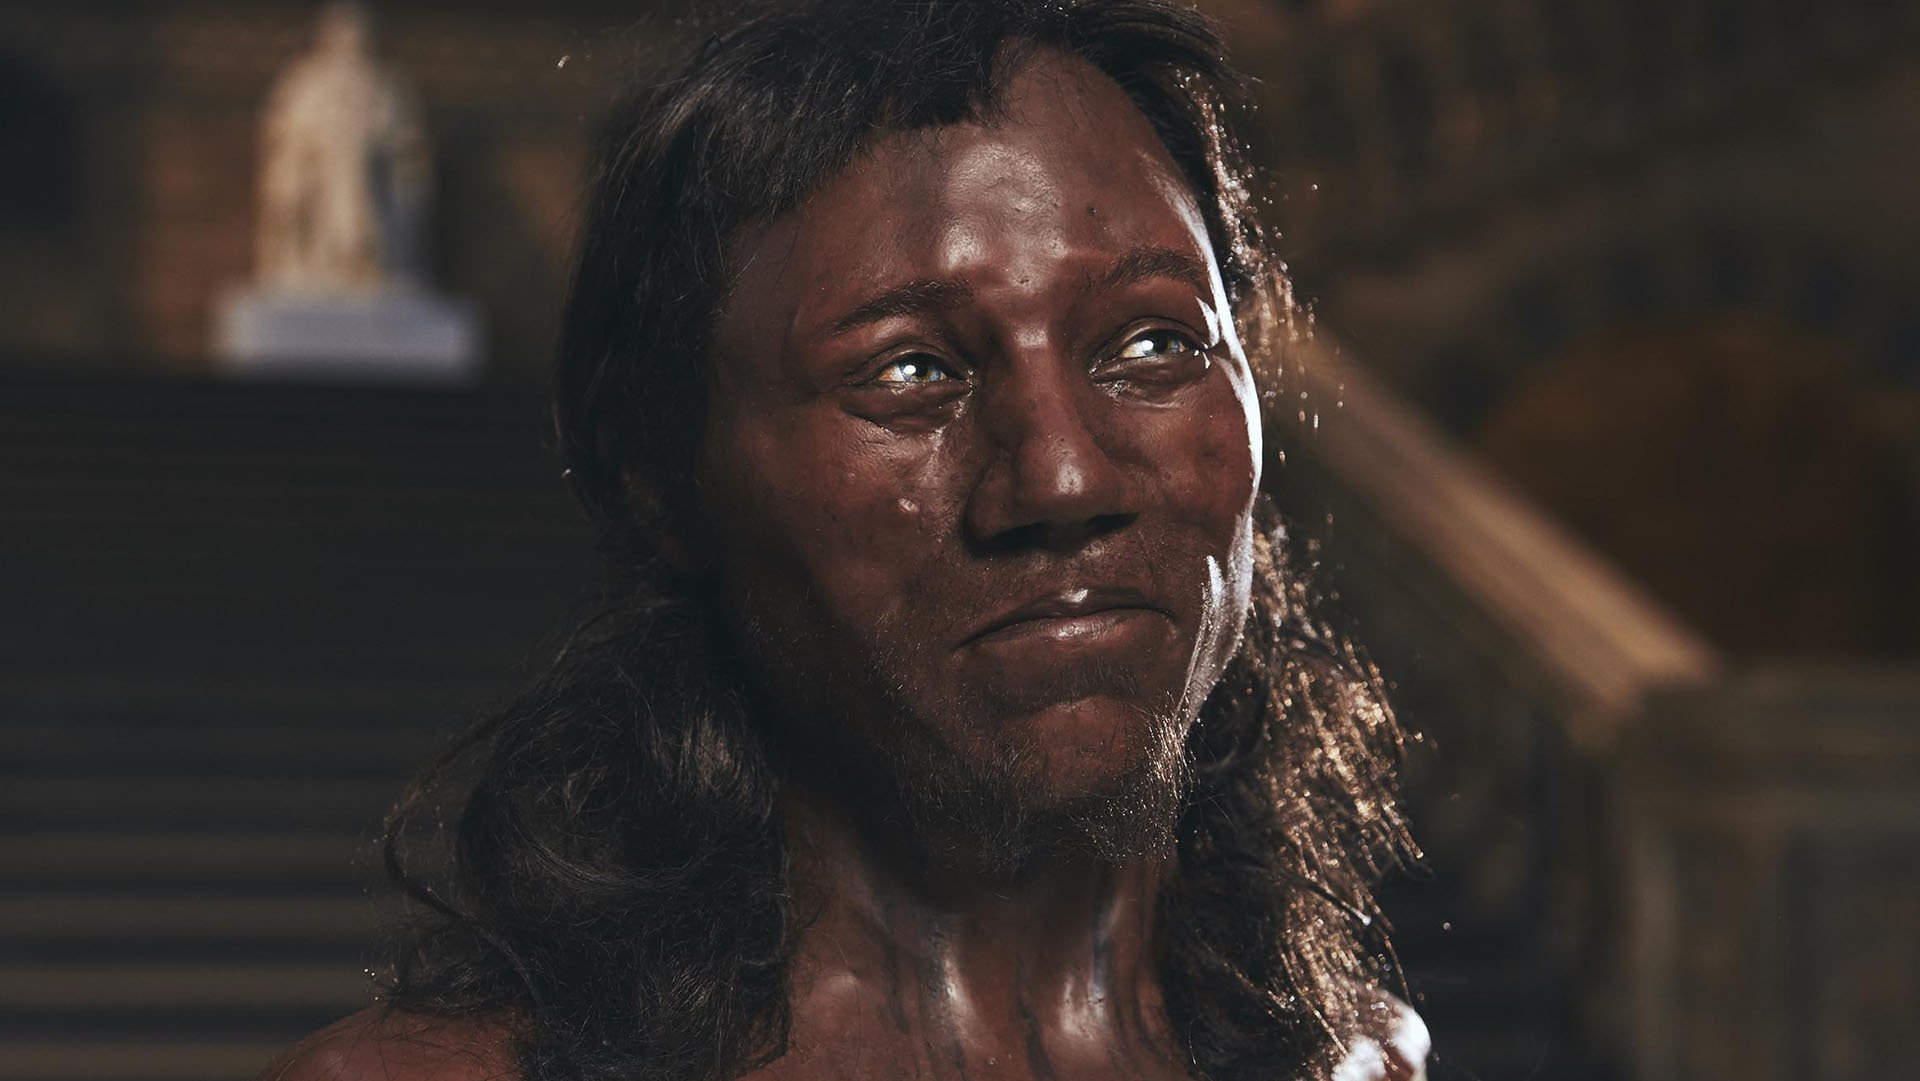 Scientists reveal 10,000-year-old British man had dark skin and blue eyes https://t.co/V95Z2HVnUD https://t.co/hJhunvNM0Q